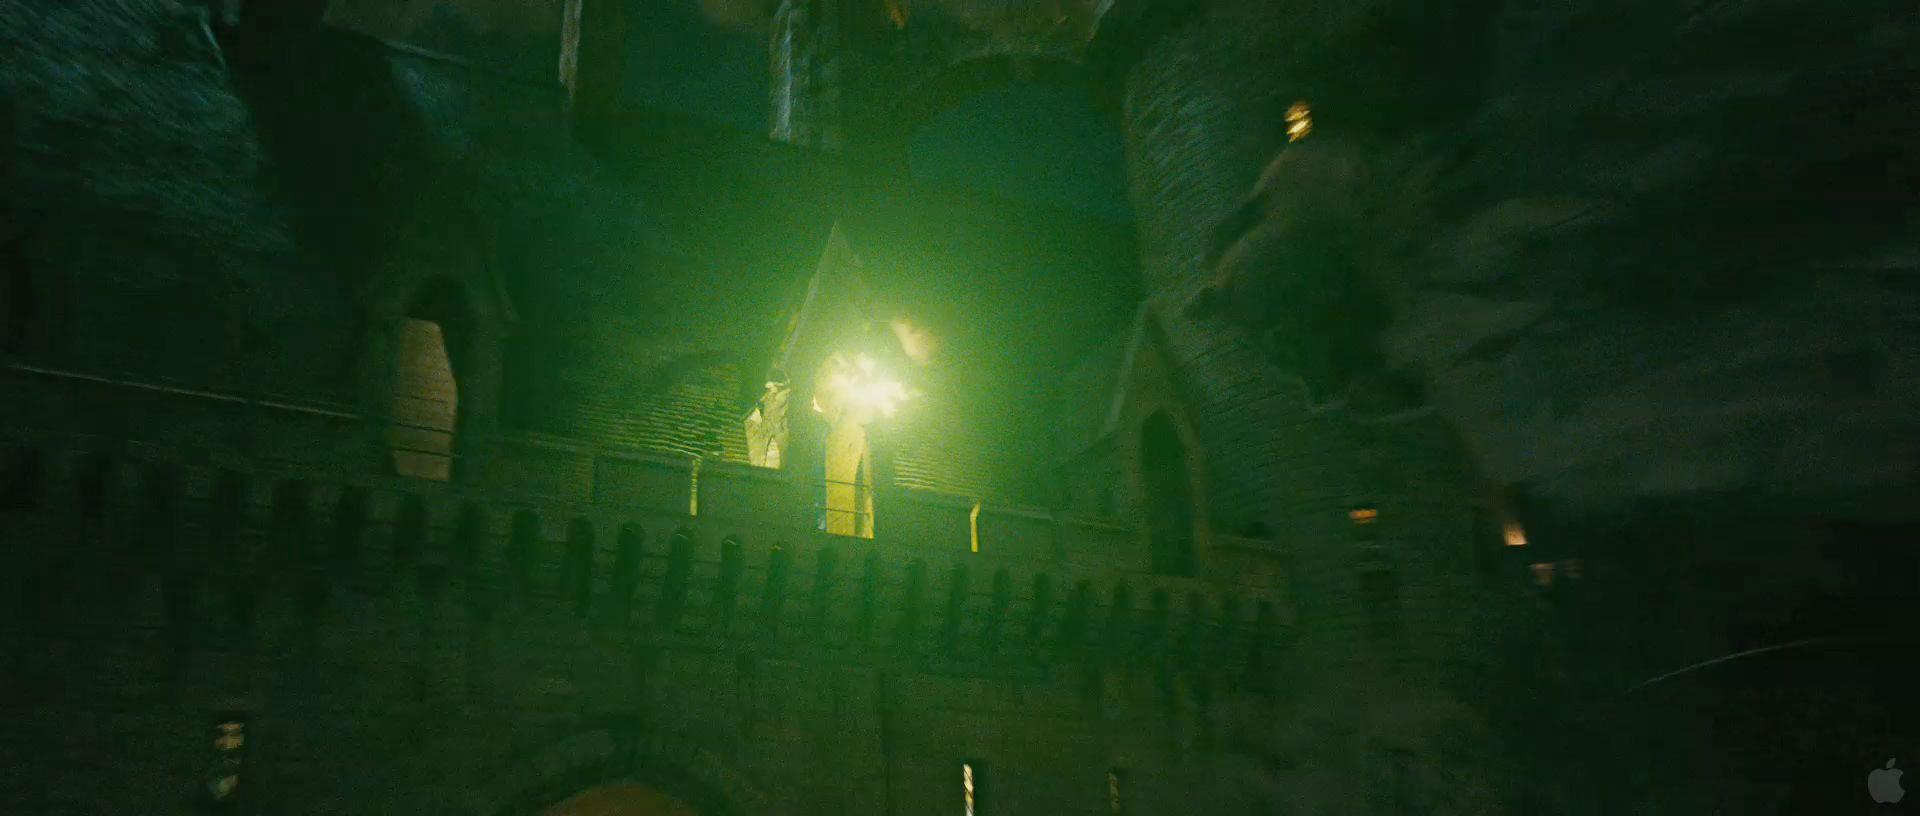 Harry Potter BlogHogwarts HP7 2 Trailer 34